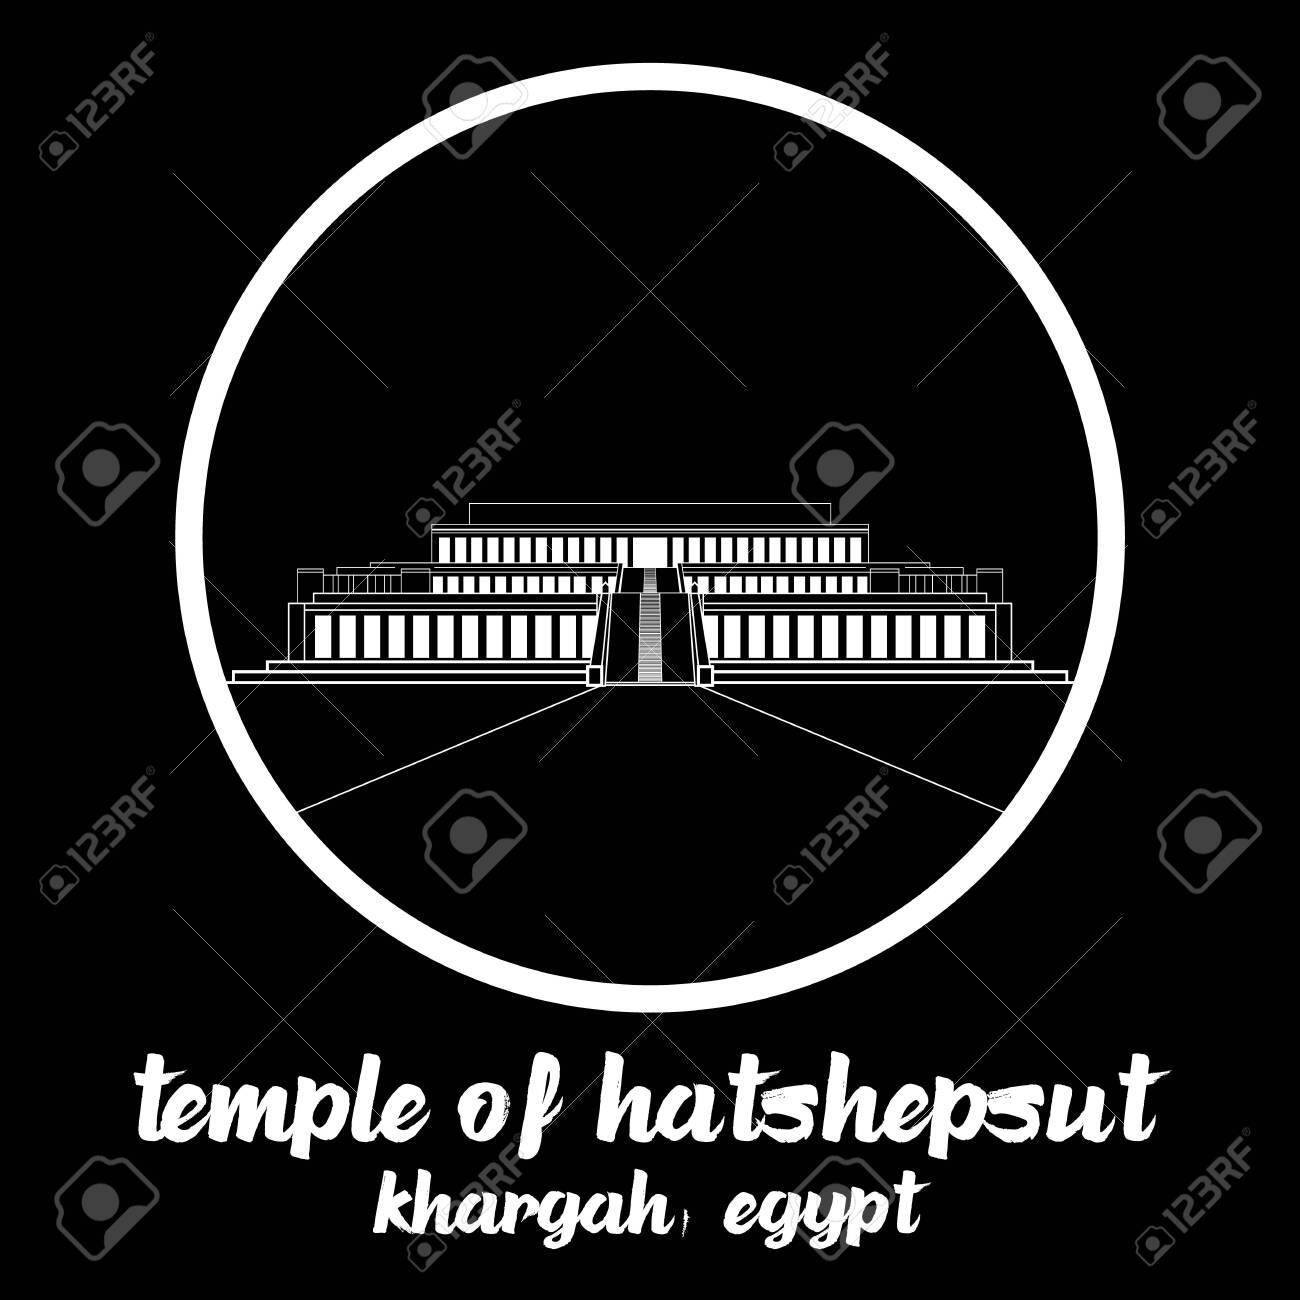 Circle Icon Temple of Hatshepsut. vector illustration - 133311794